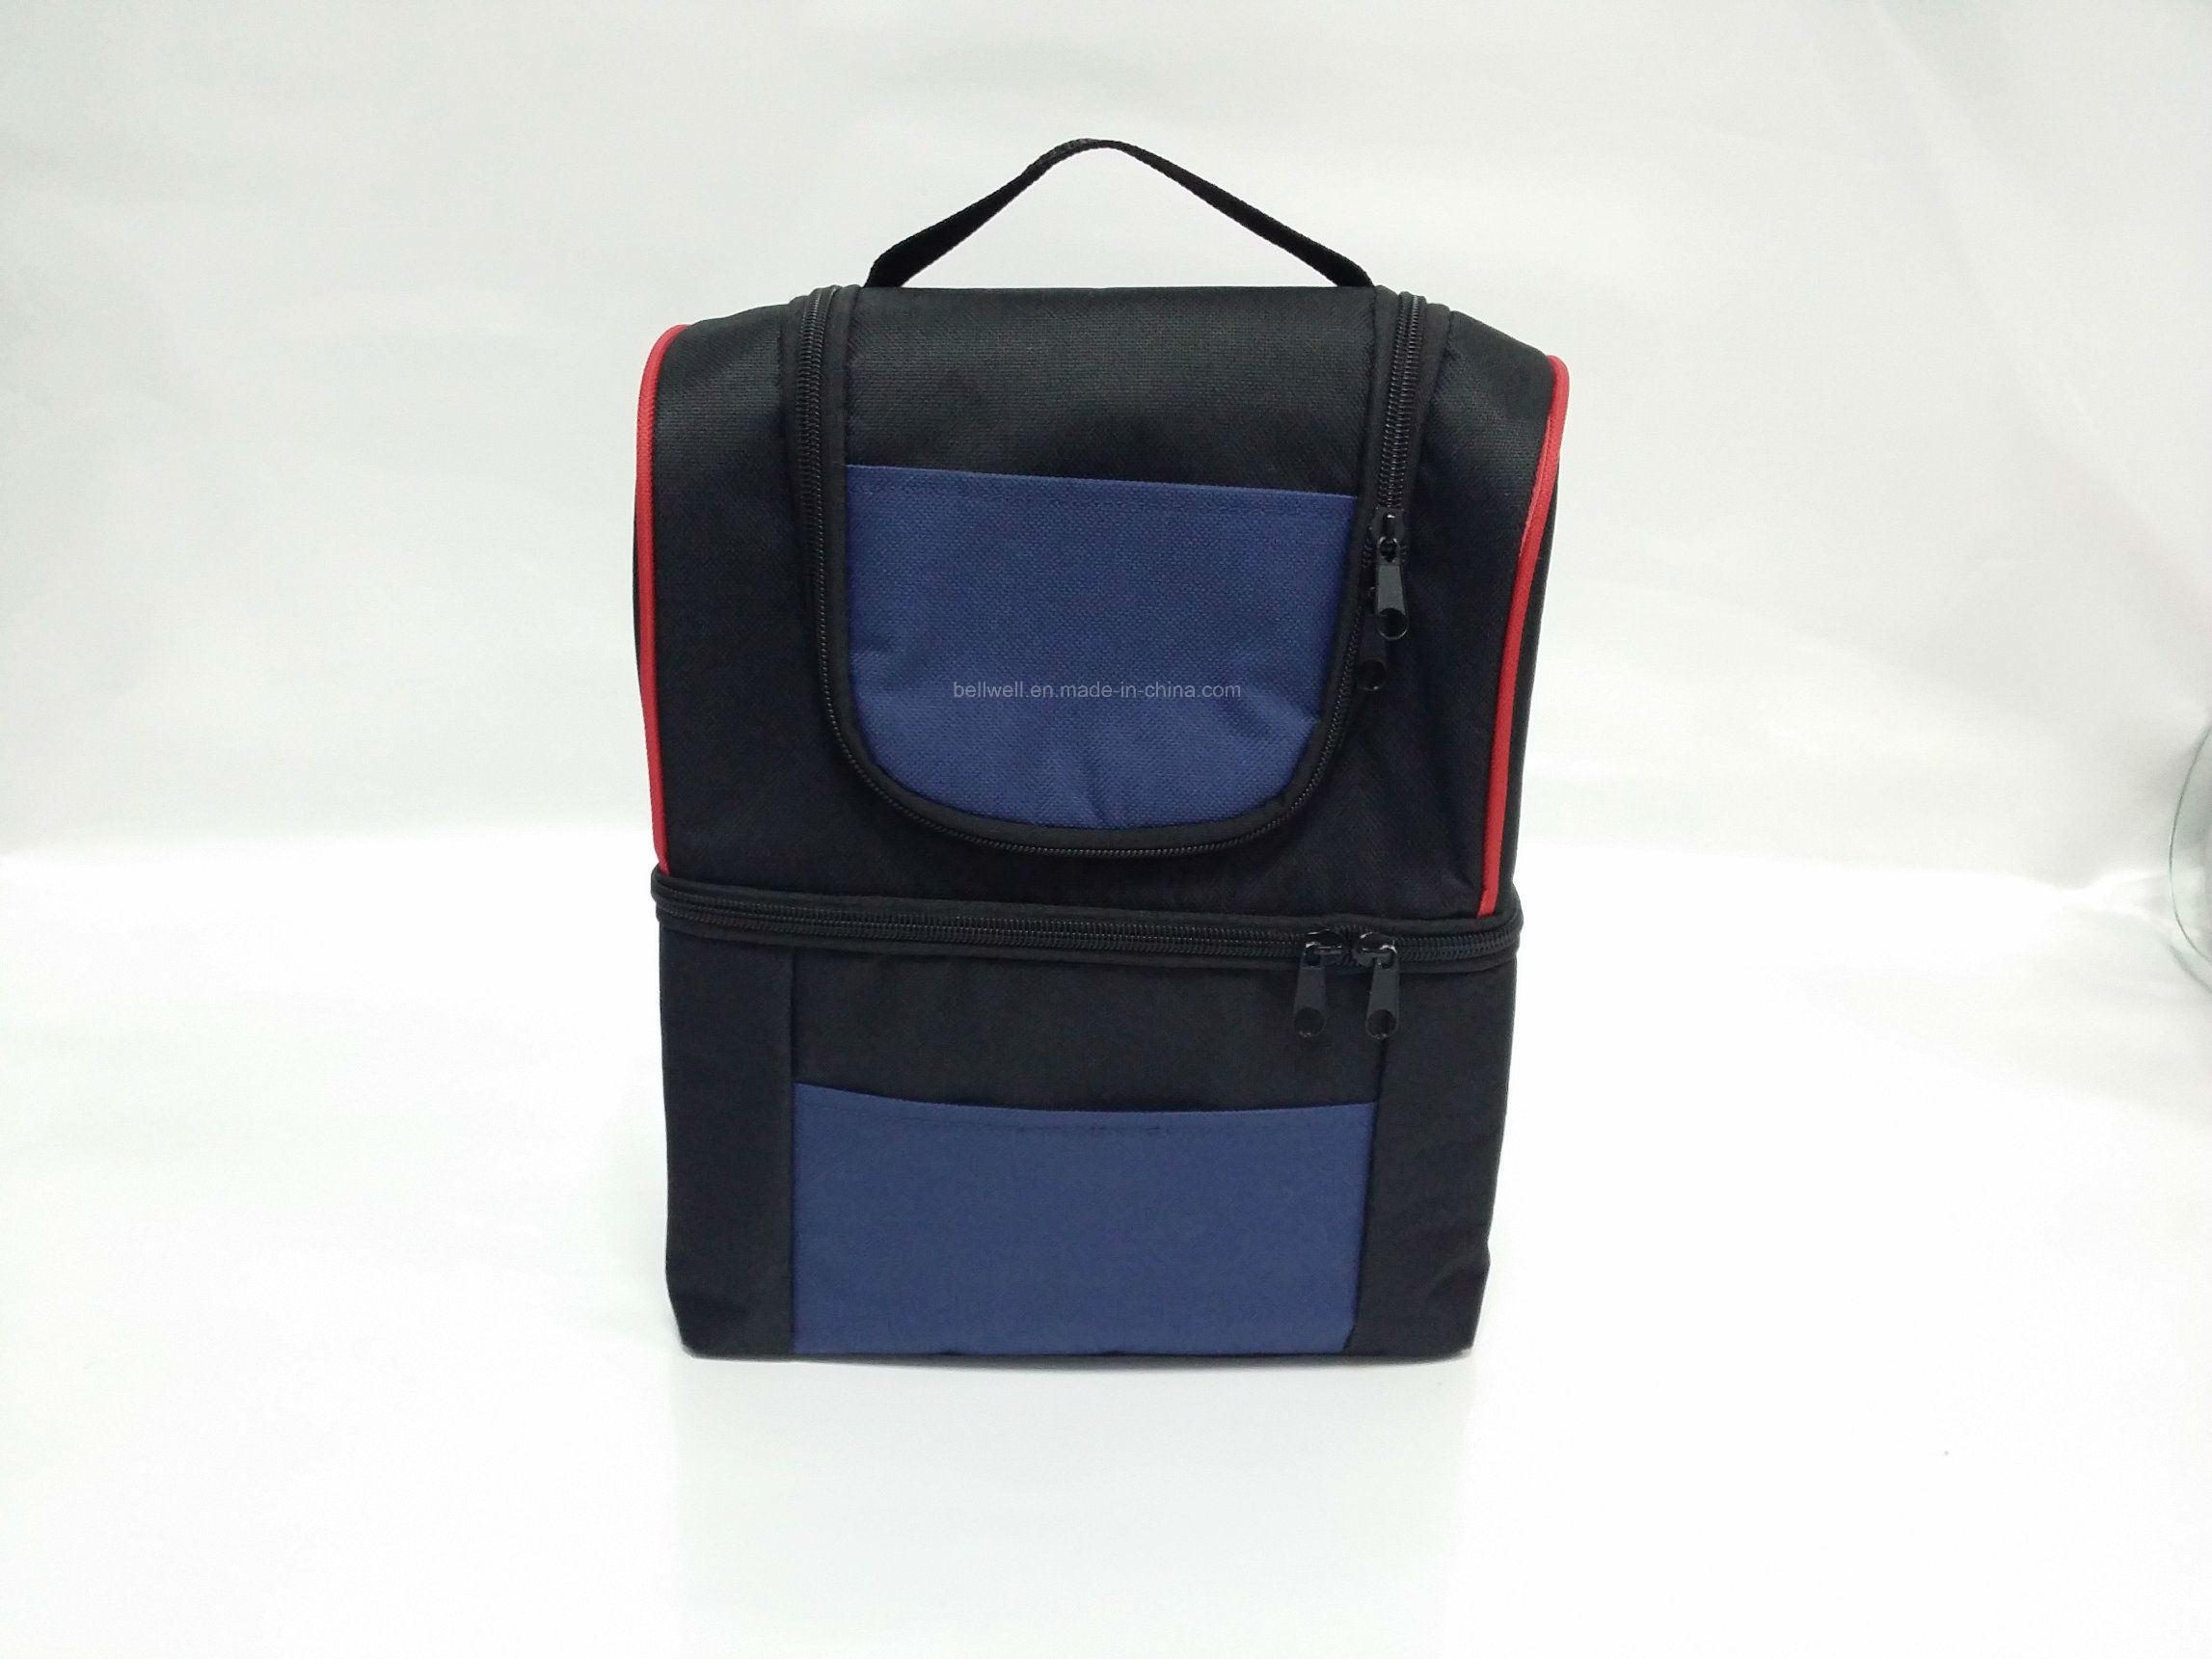 Double-Decker Cooler Bag Travel Bag